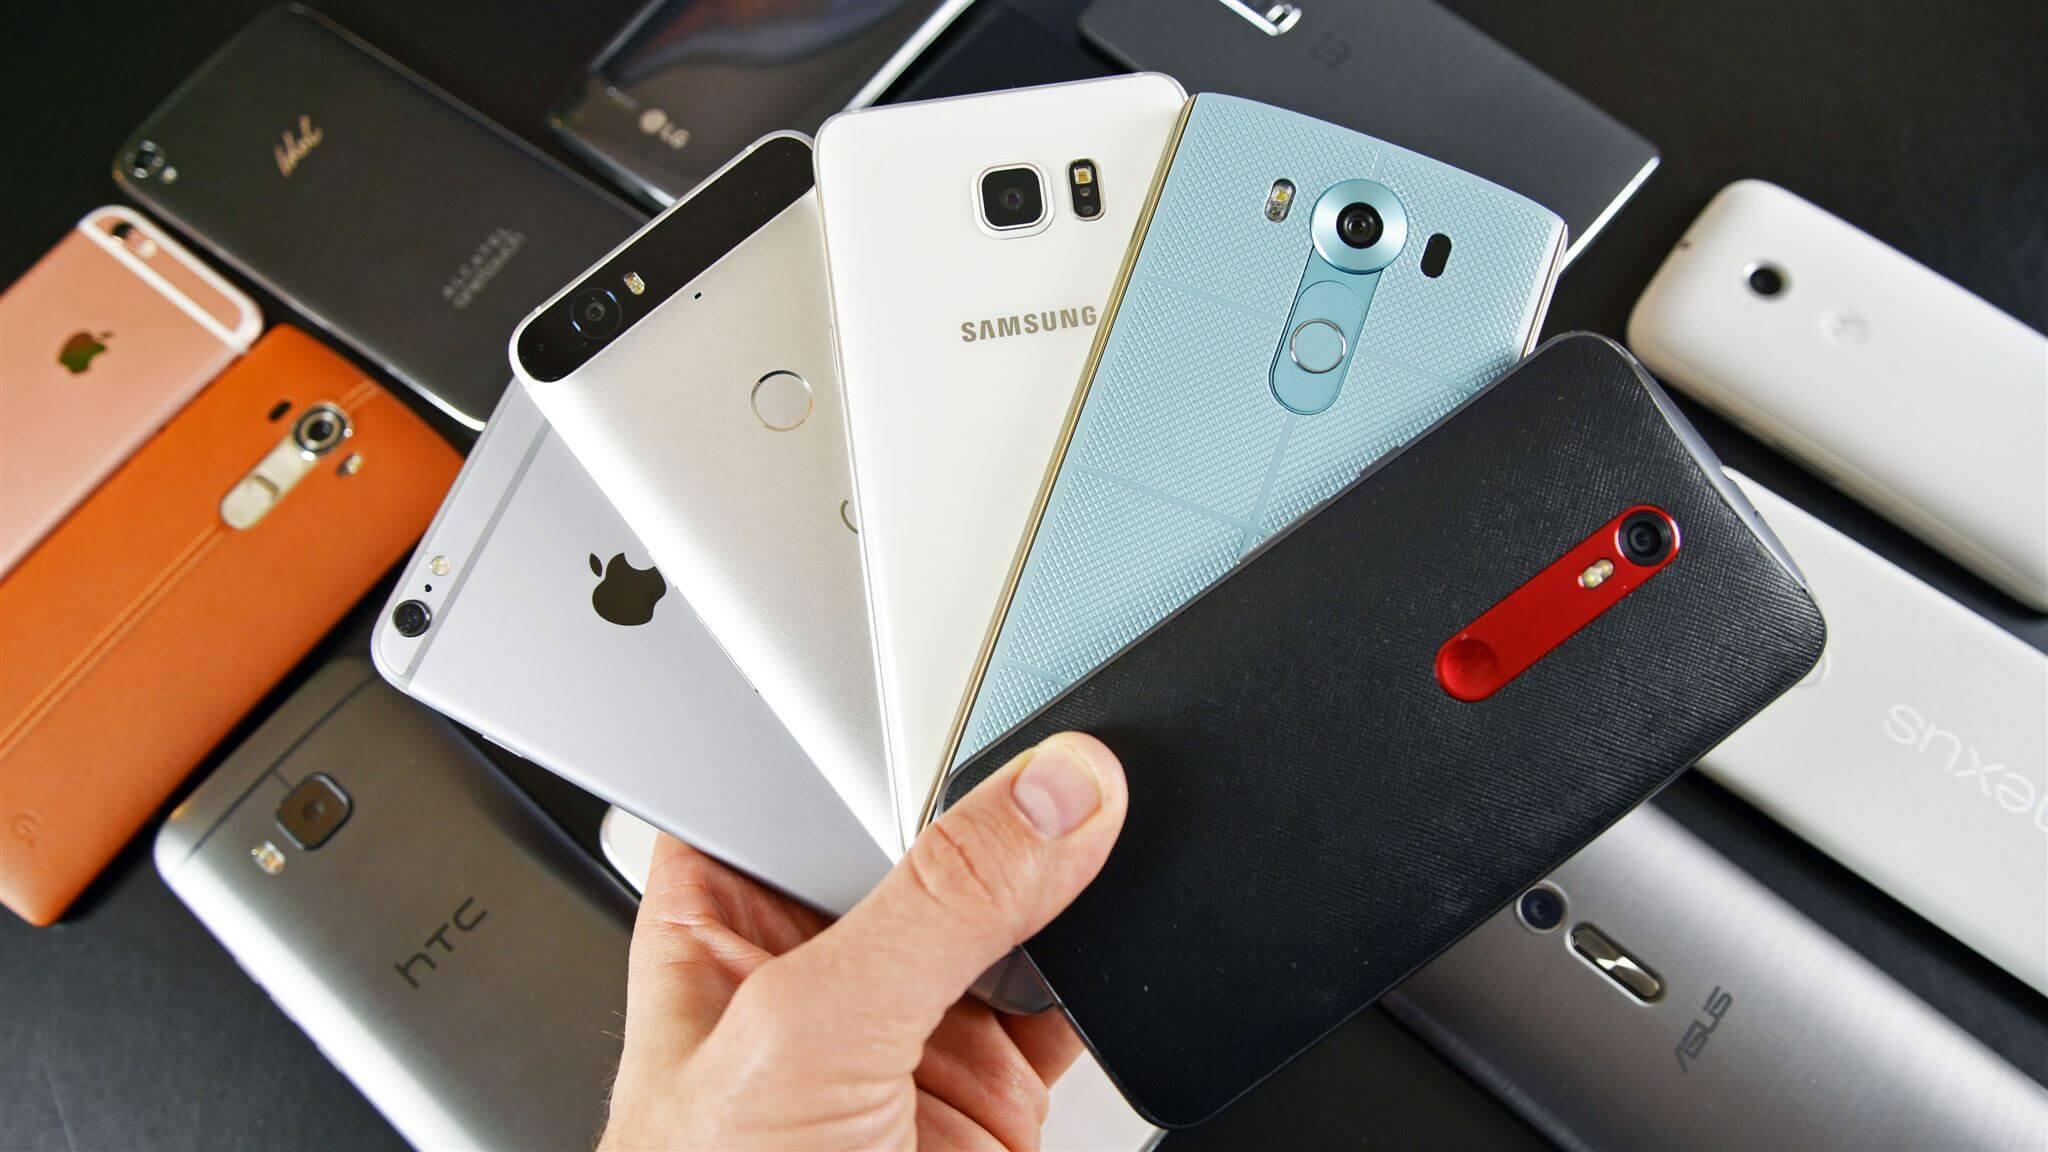 ТОП-5 смартфонов до 15 000